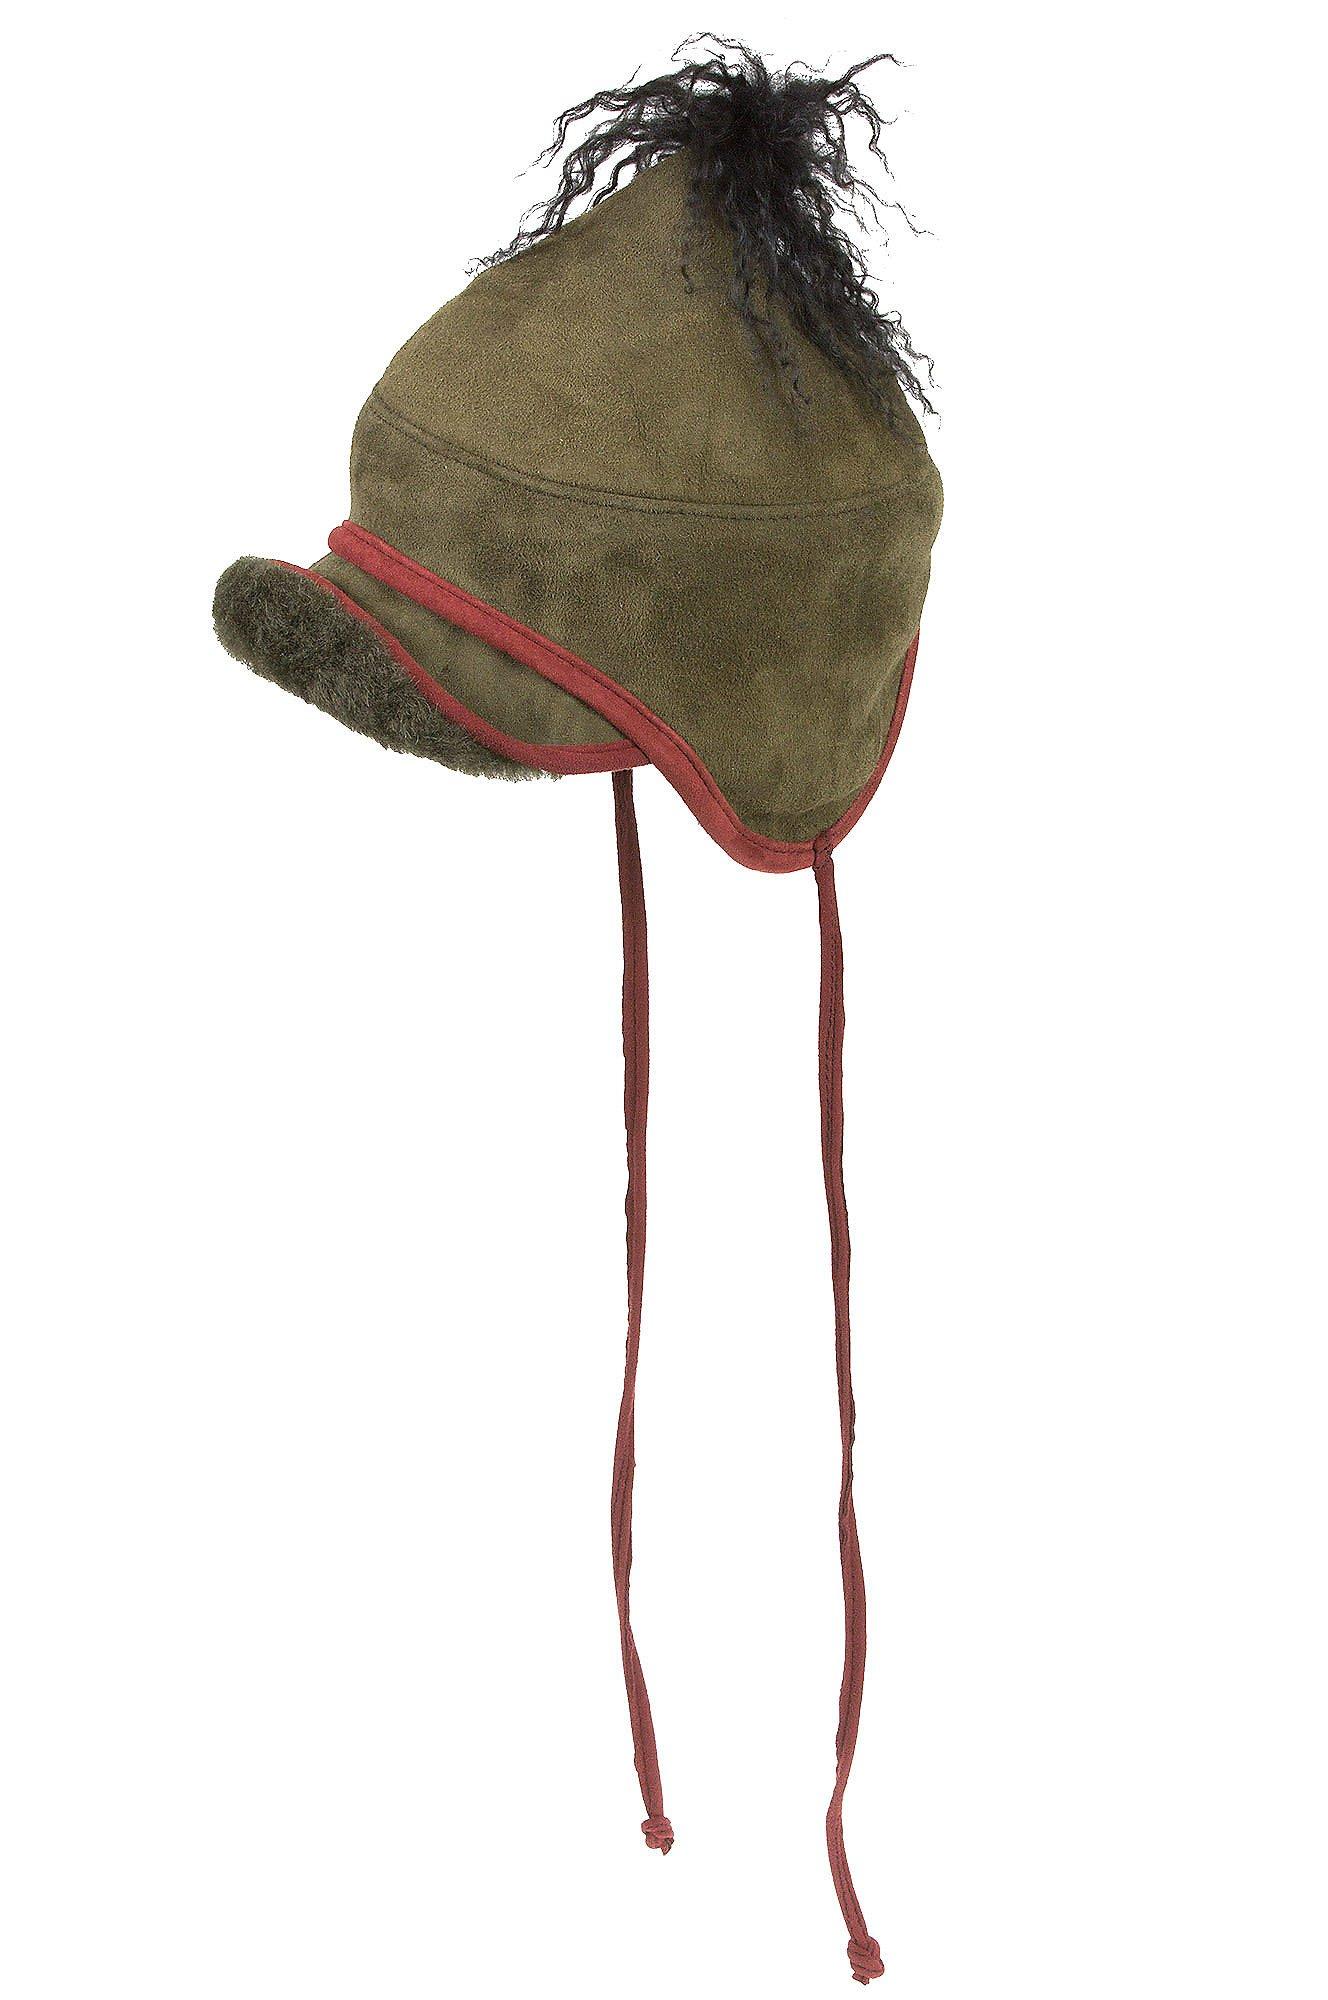 Overland Sheepskin Co. Tibetan Shearling Sheepskin Trapper Hat